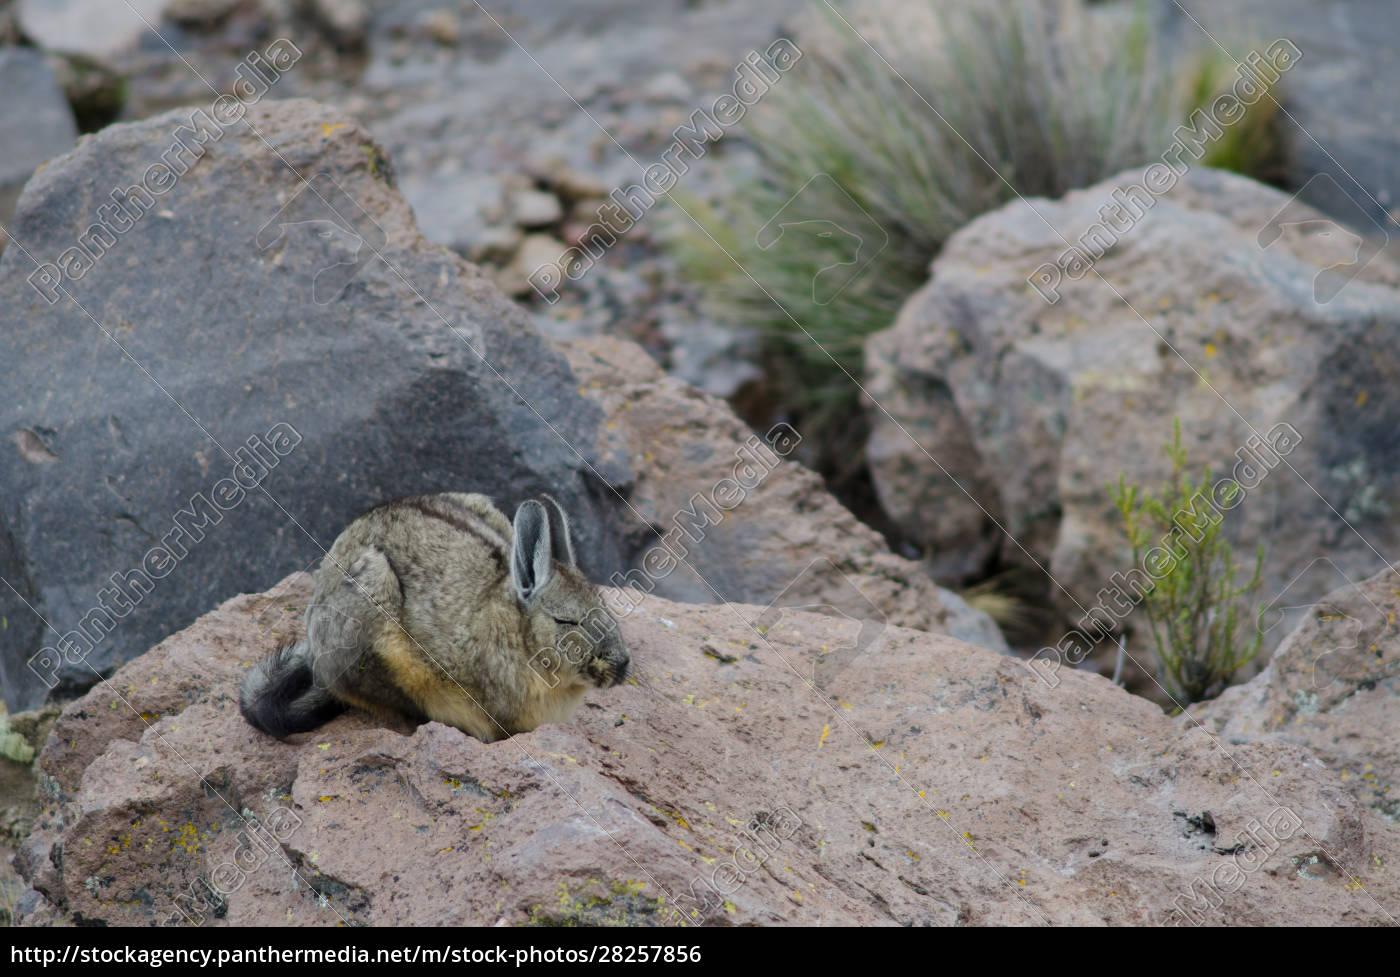 southern, viscacha, lagidium, viscacia, sleeping, on - 28257856